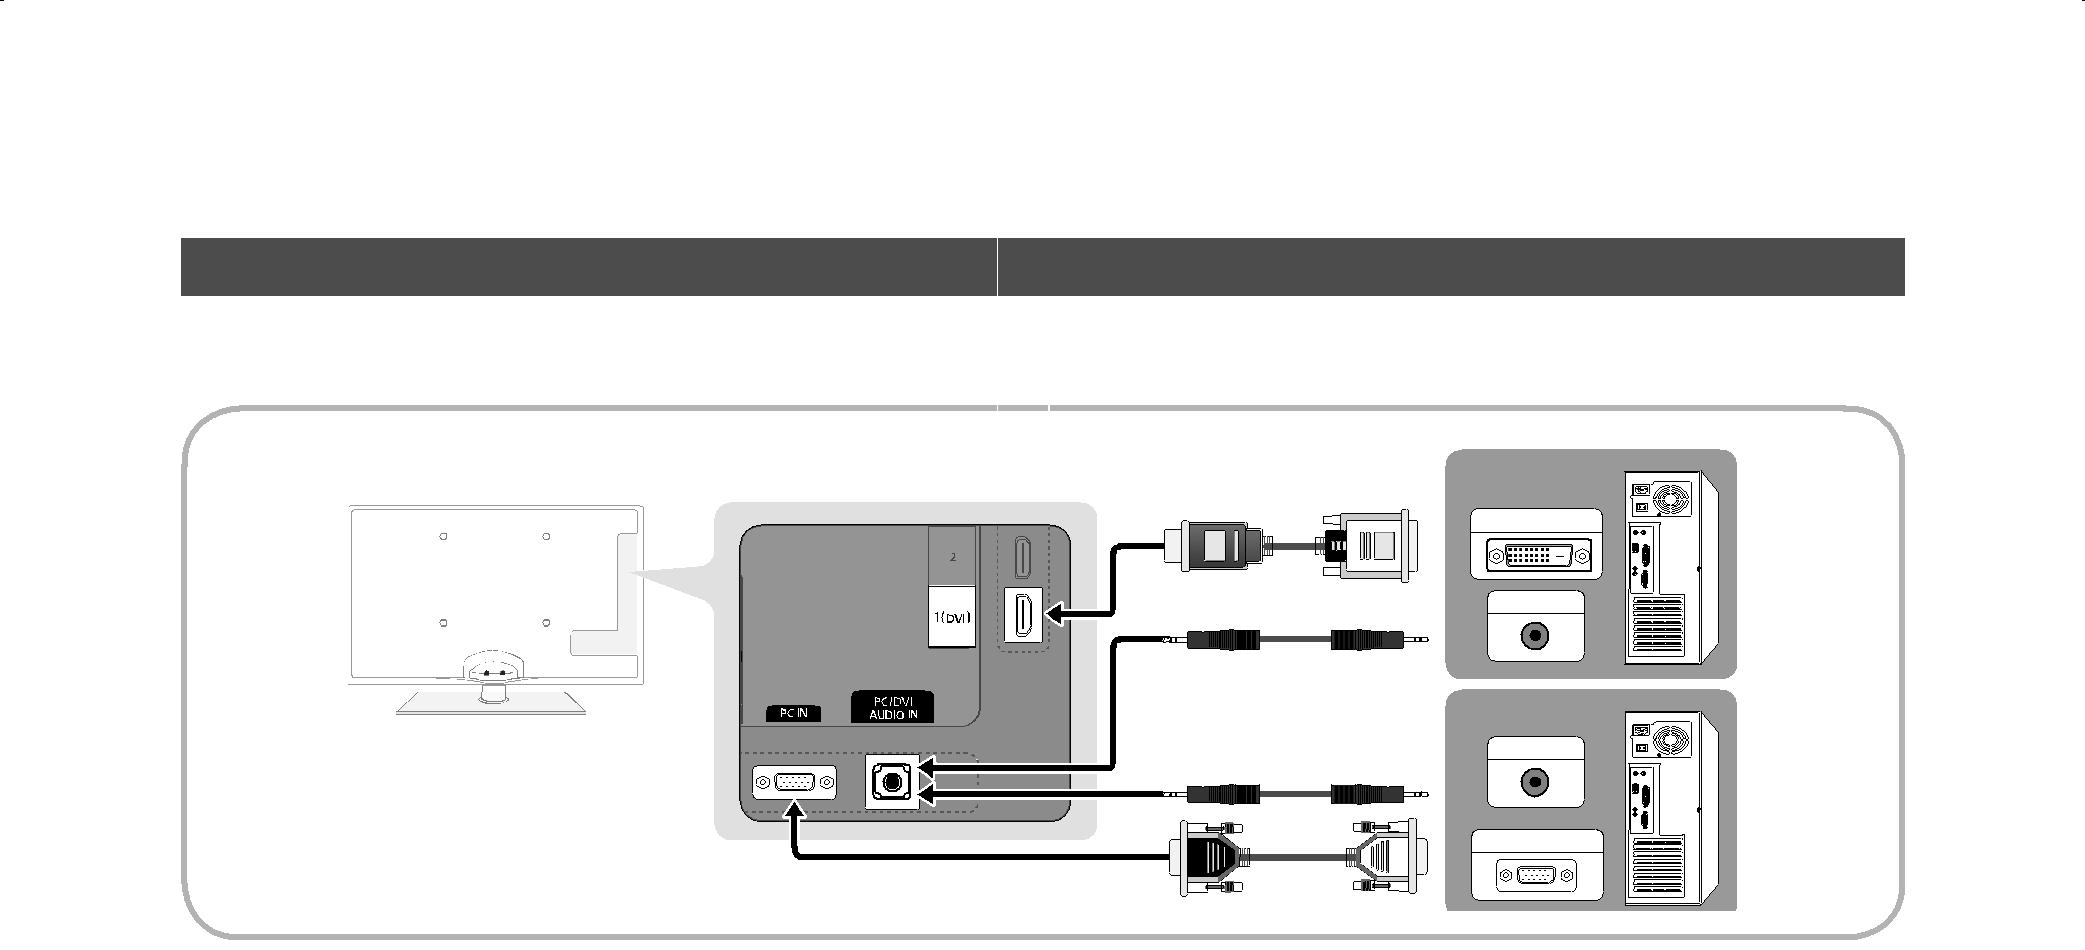 Samsung UE32C6500UWXXC, UE32C6500UWXXH, UE32C6510UWXXC